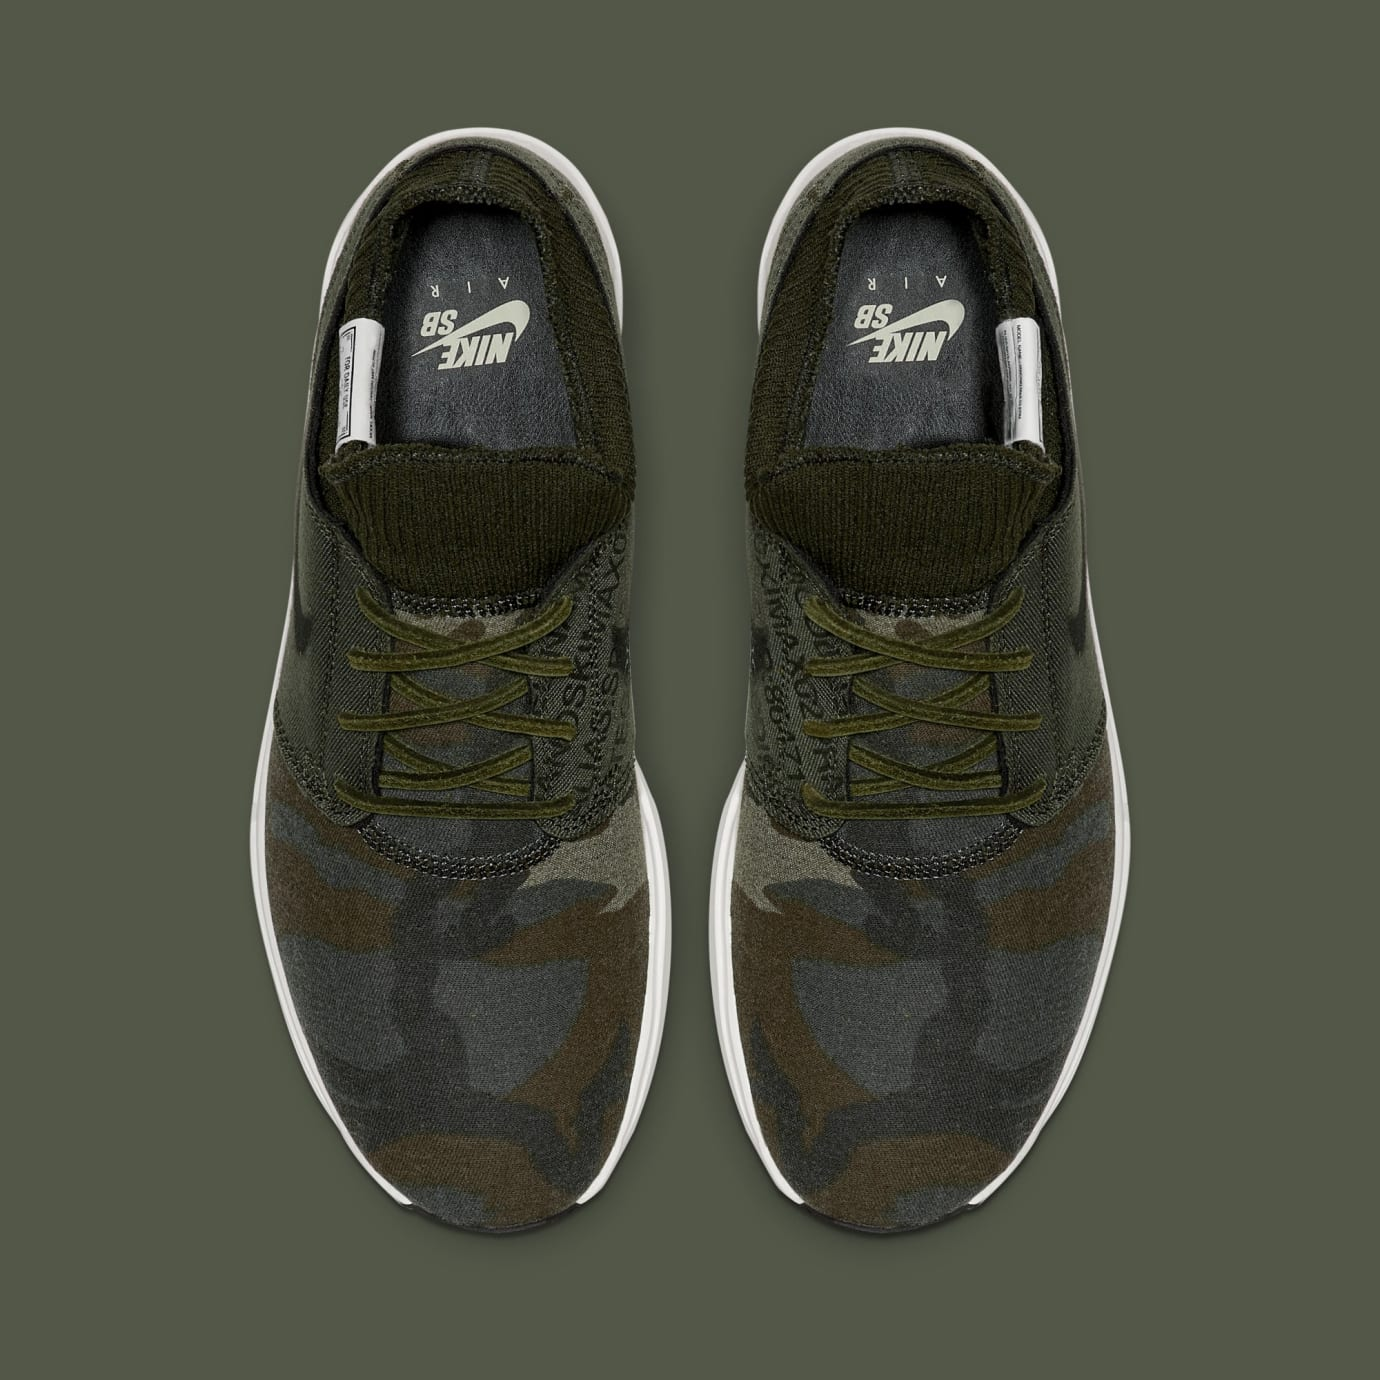 1ed00ce2468e Nike SB Air Max Janoski 2 AQ7447-001 AQ7447-100 AT5878-203 Release ...